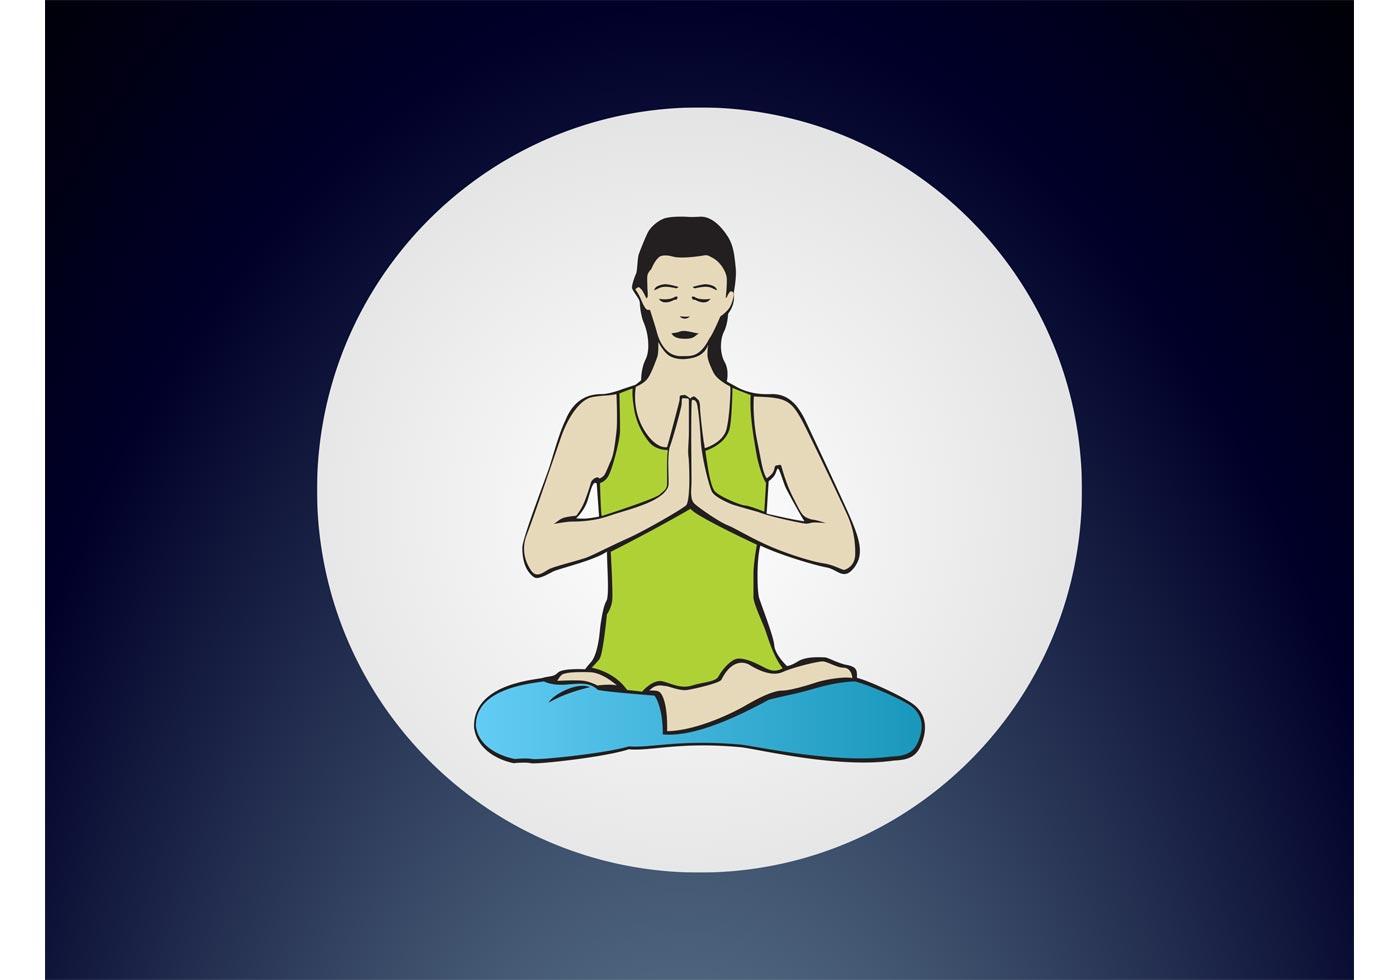 Yoga Lotus Pose Download Free Vector Art Stock Graphics Images